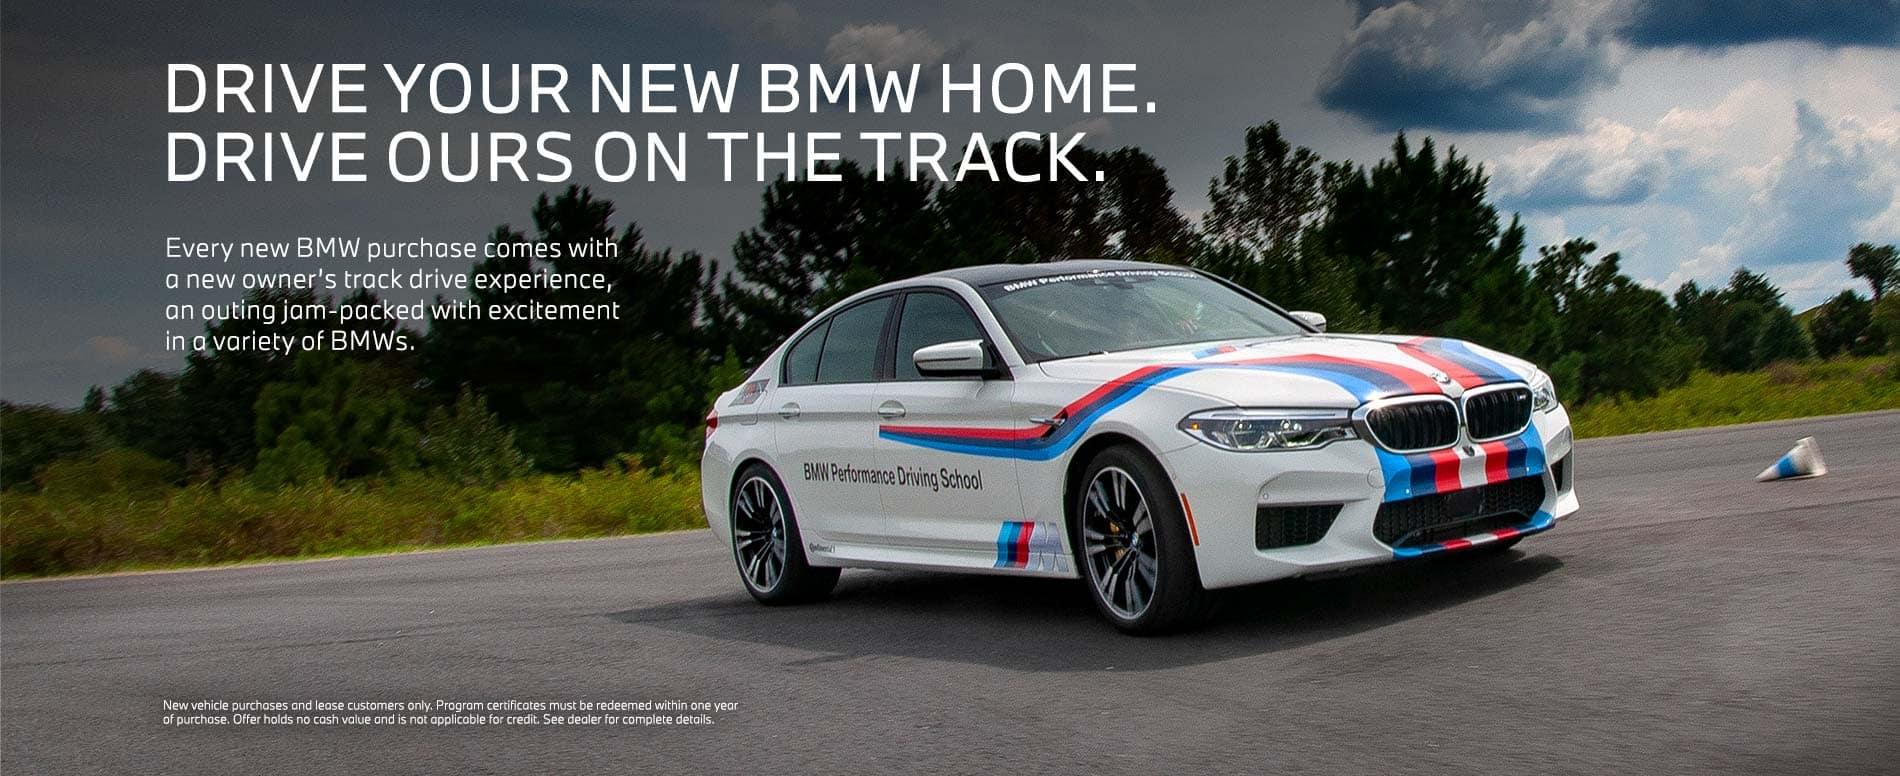 BMWAlbany_Slide_1900x776_07-21_Performance